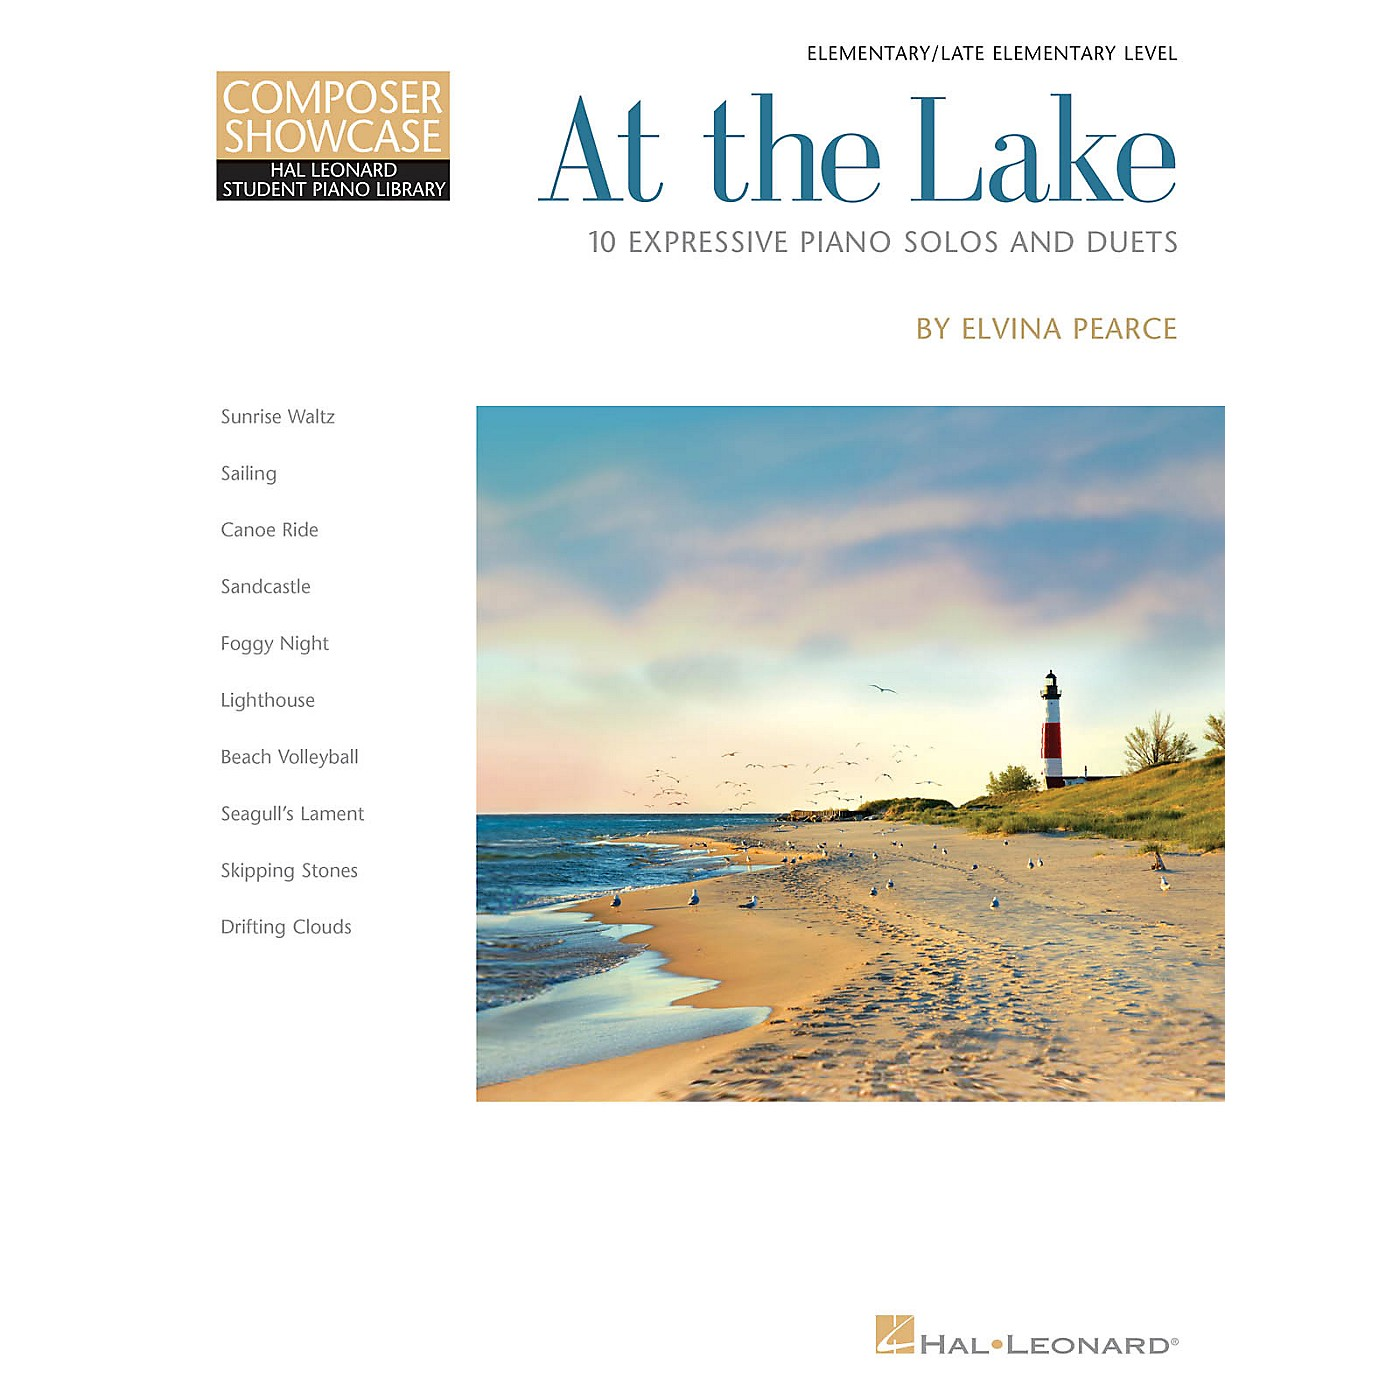 Hal Leonard At the Lake Piano Library Series Book by Elvina Pearce (Level Late Elem) thumbnail